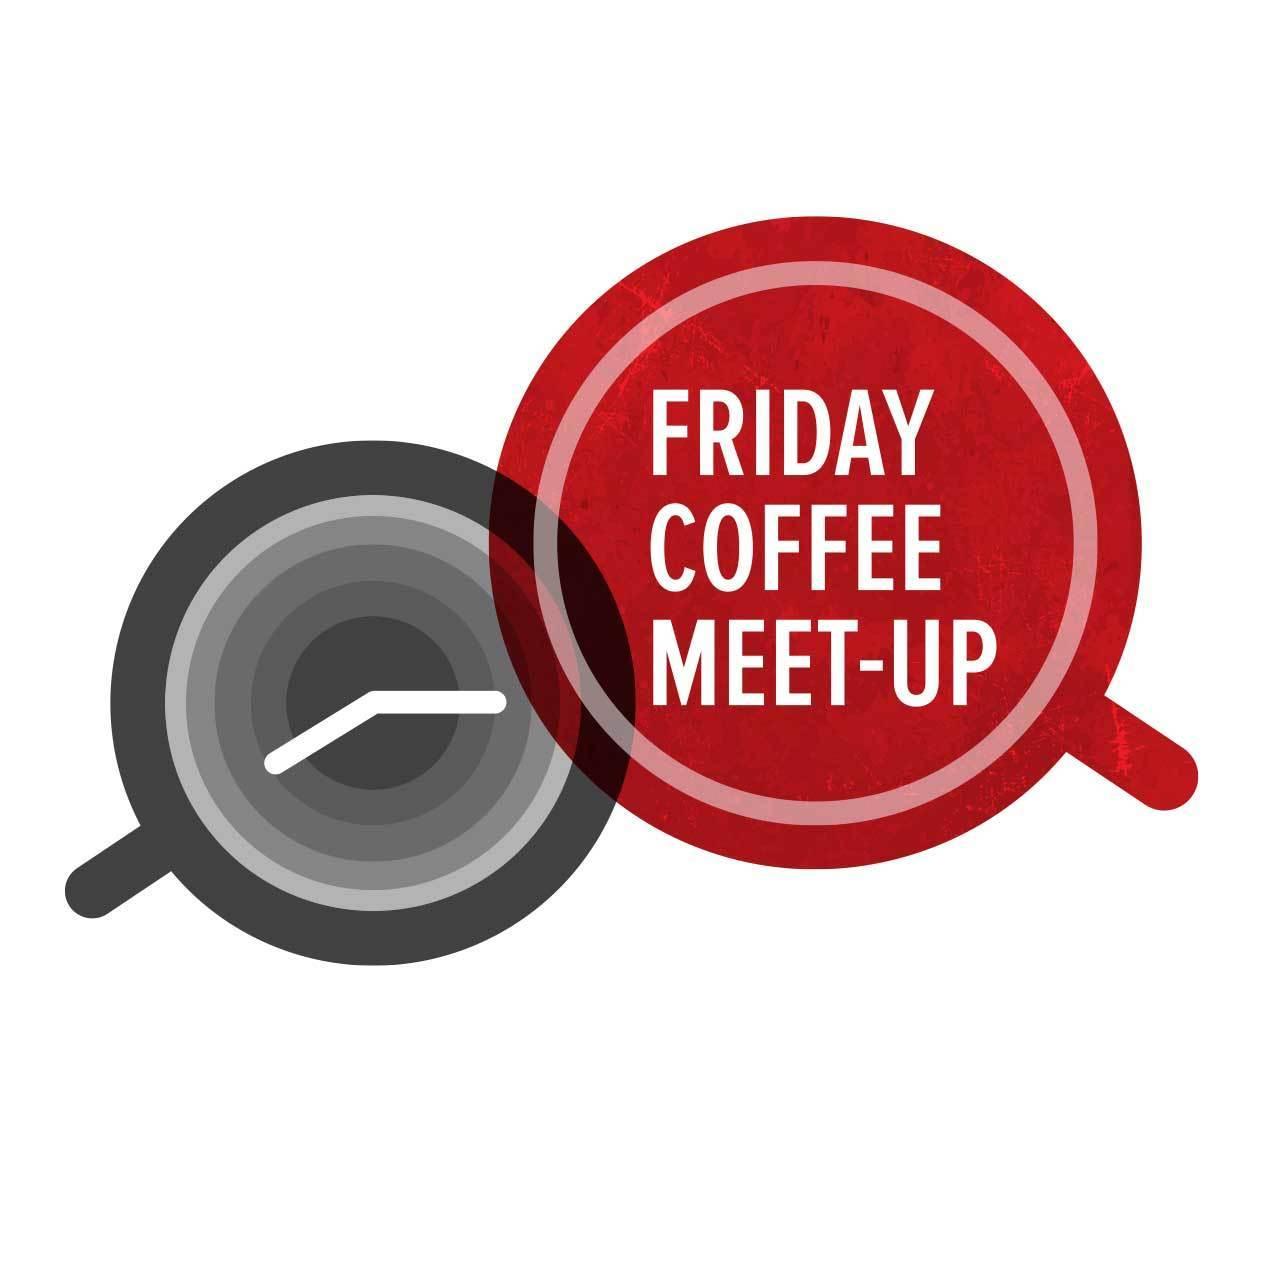 Friday_Coffee_Meetup.jpg